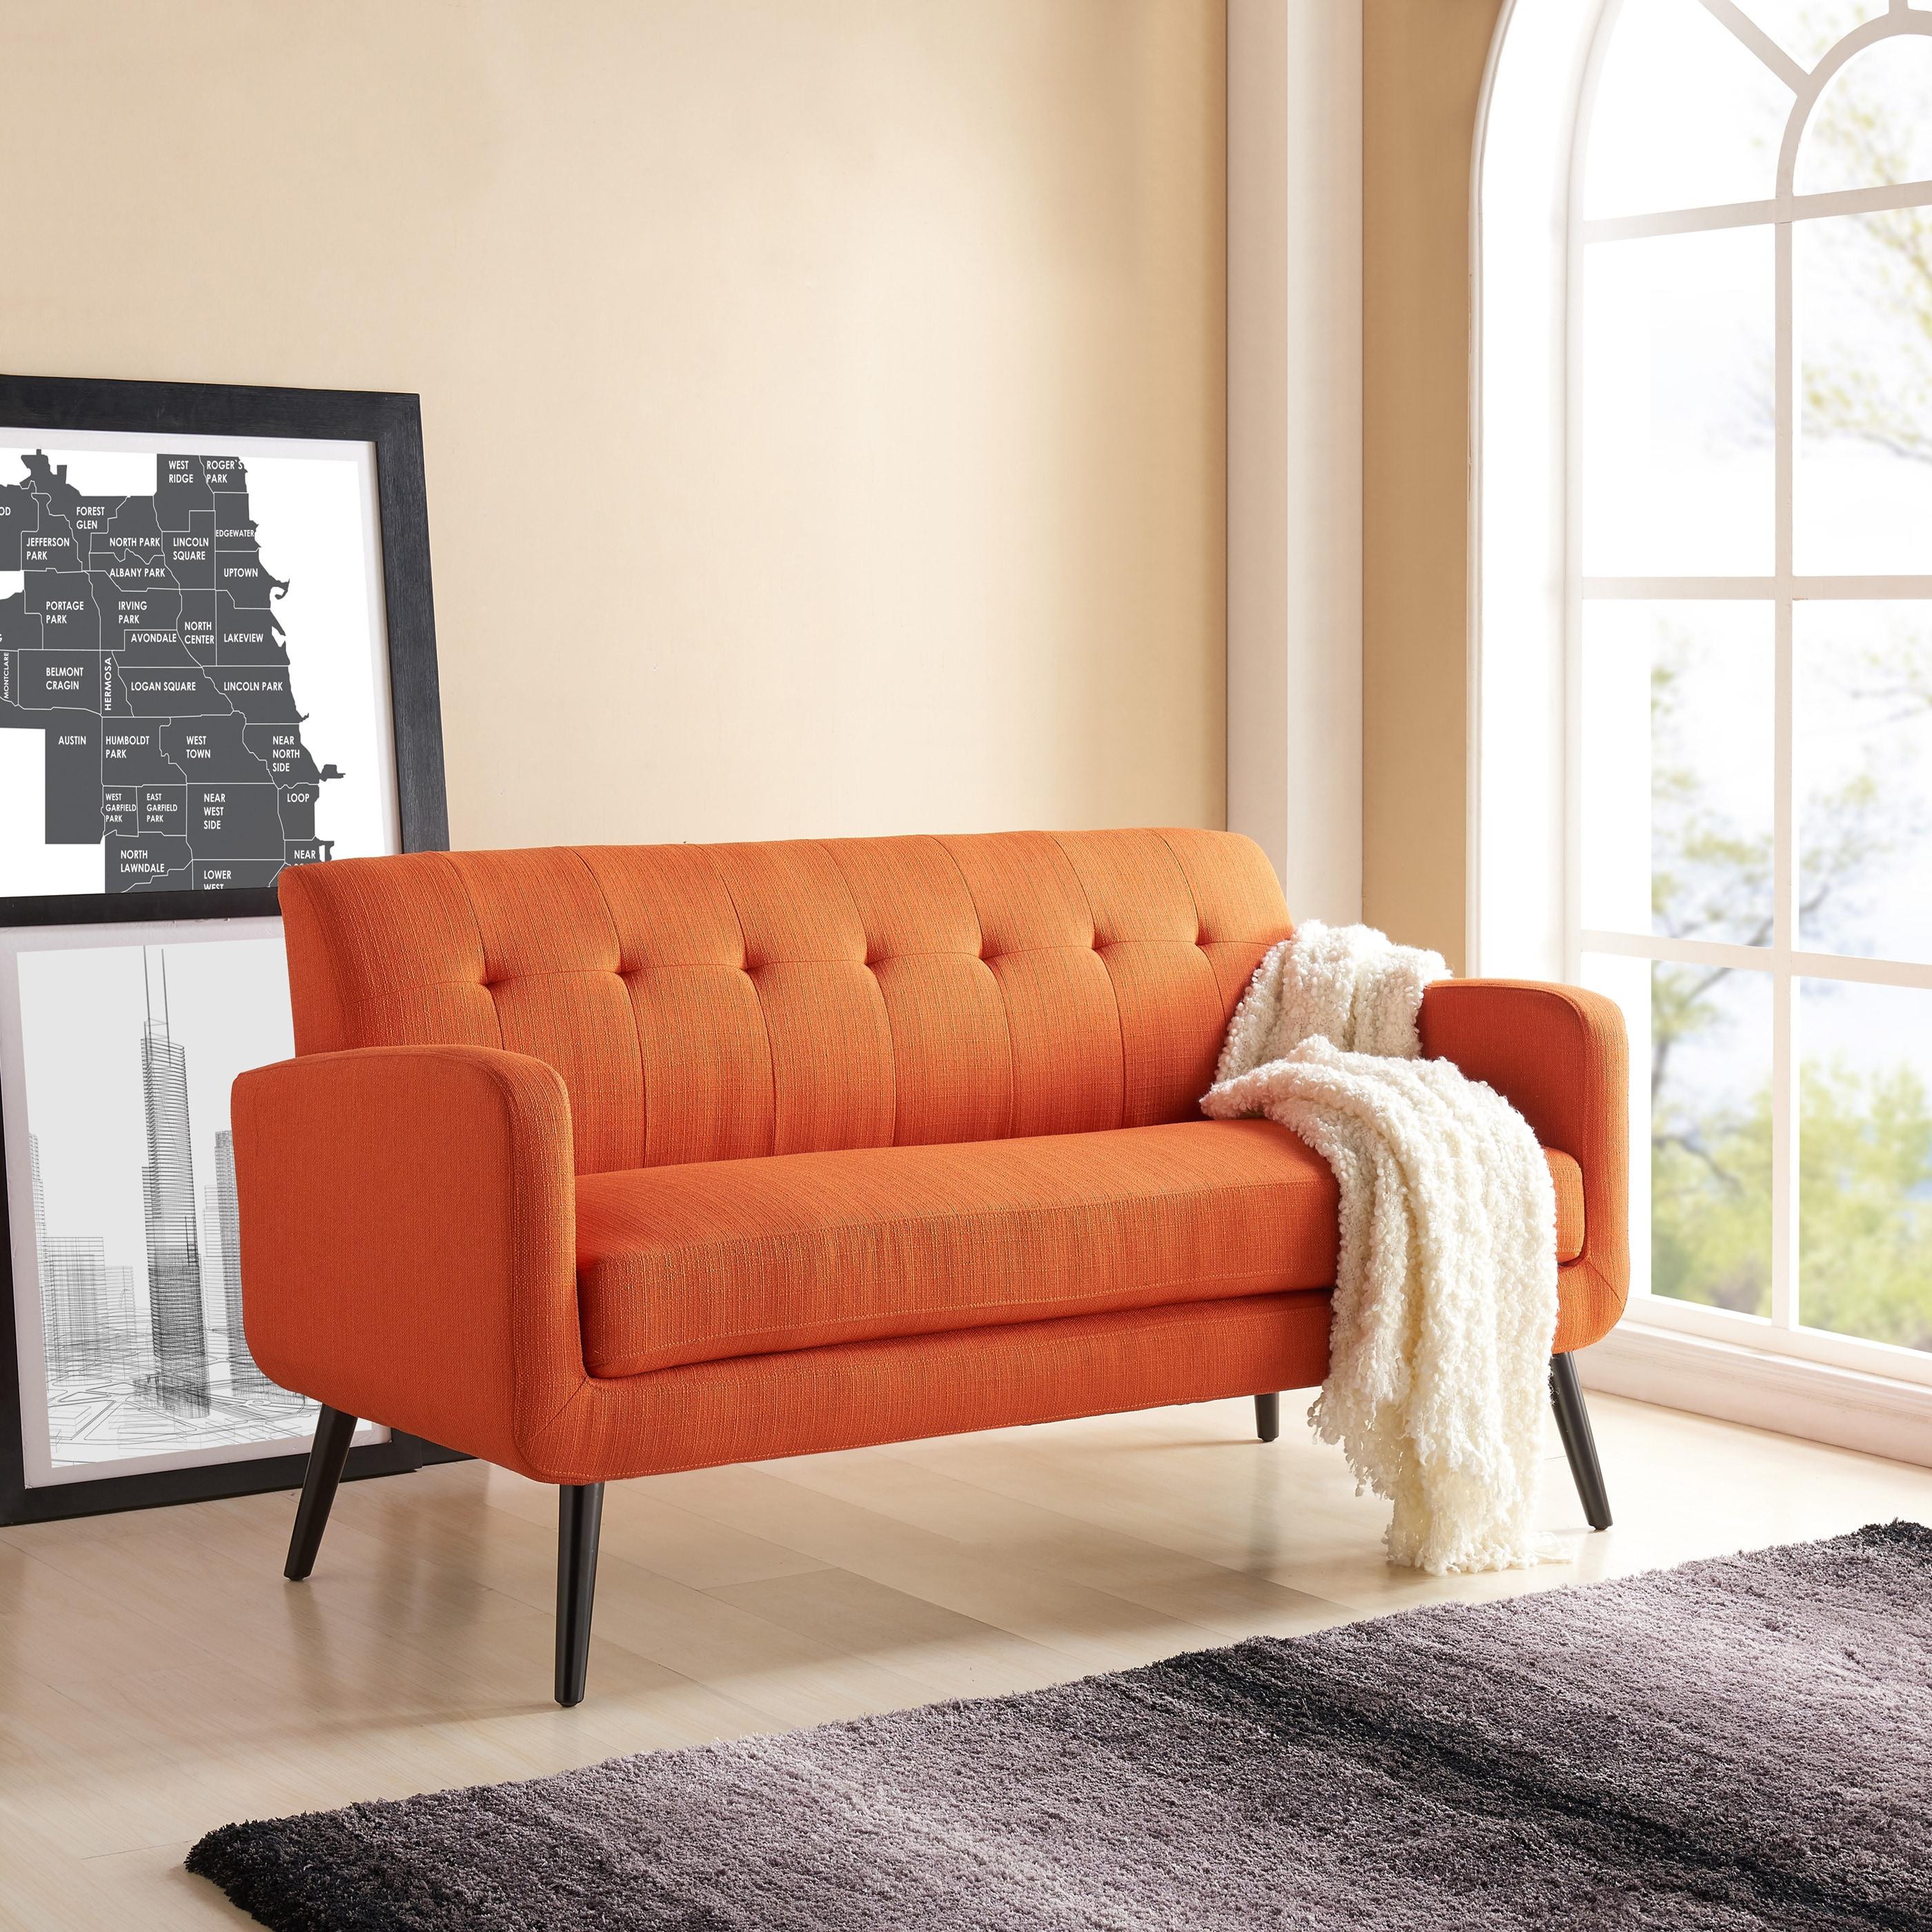 Orange Mid Century Sofa: Handy Living Kingston Mid Century Modern Orange Linen Sofa